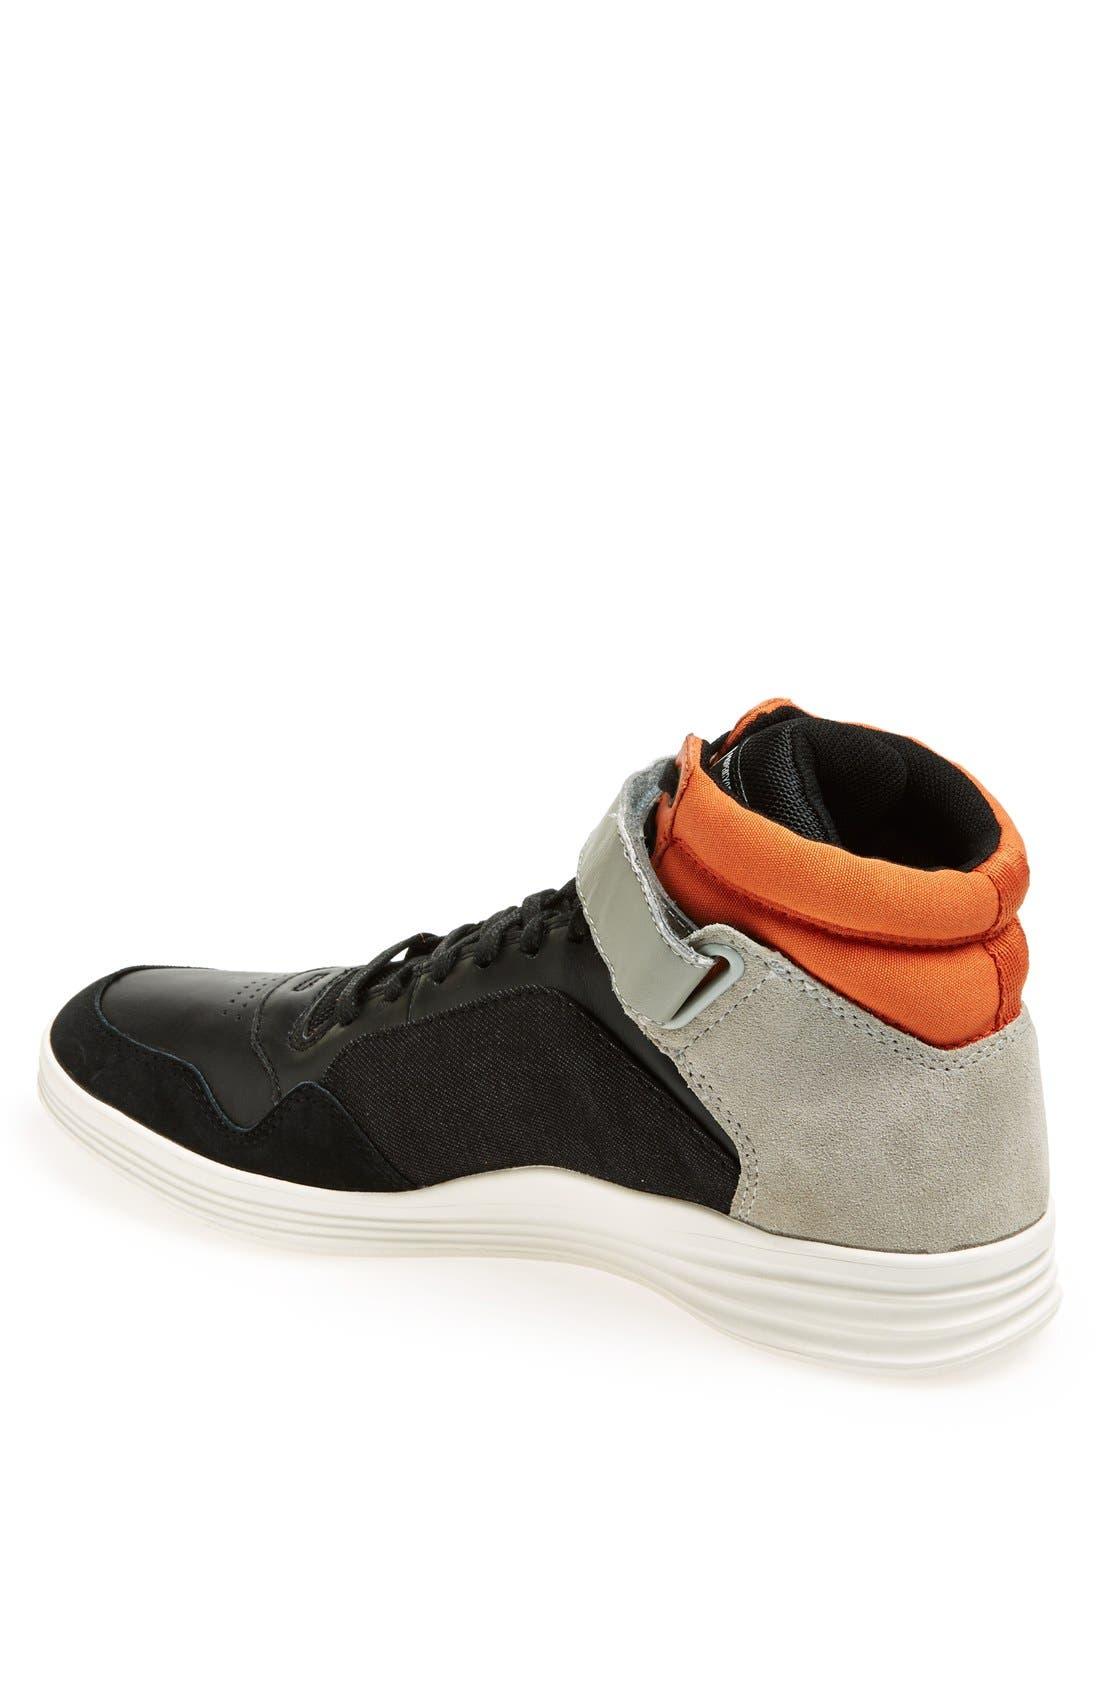 Alternate Image 2  - G-Star Raw 'Futura Outland' Sneaker